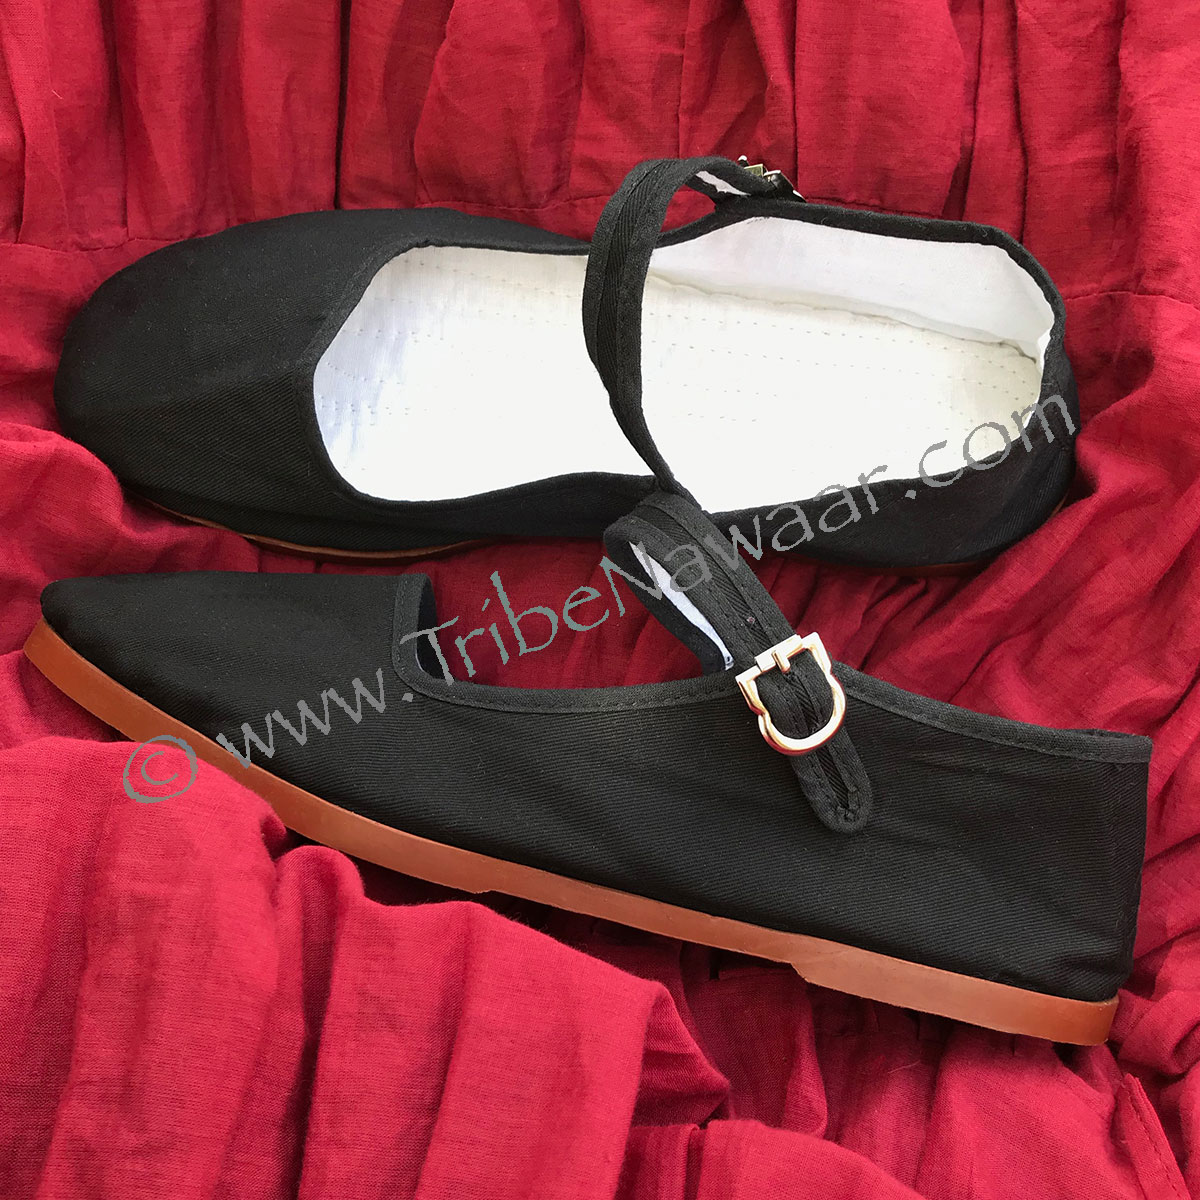 Black Canvas Belly Dance Shoes, Size 5